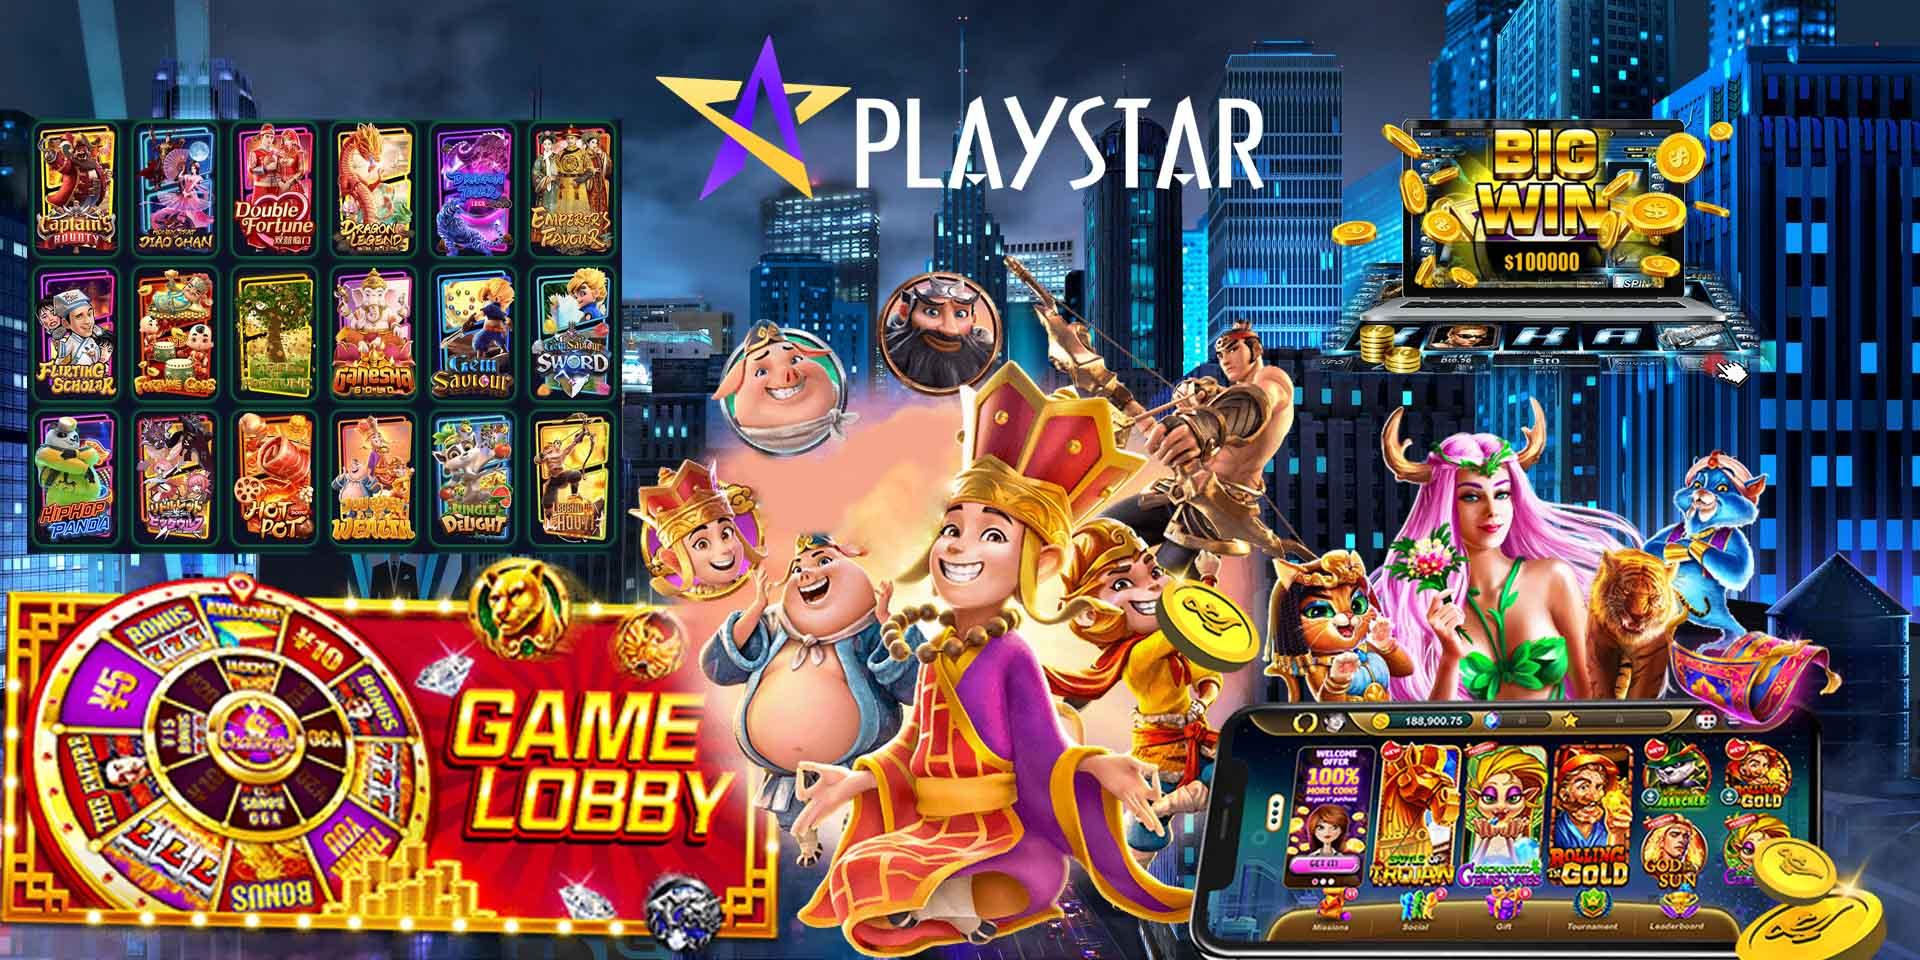 Playstar Slot